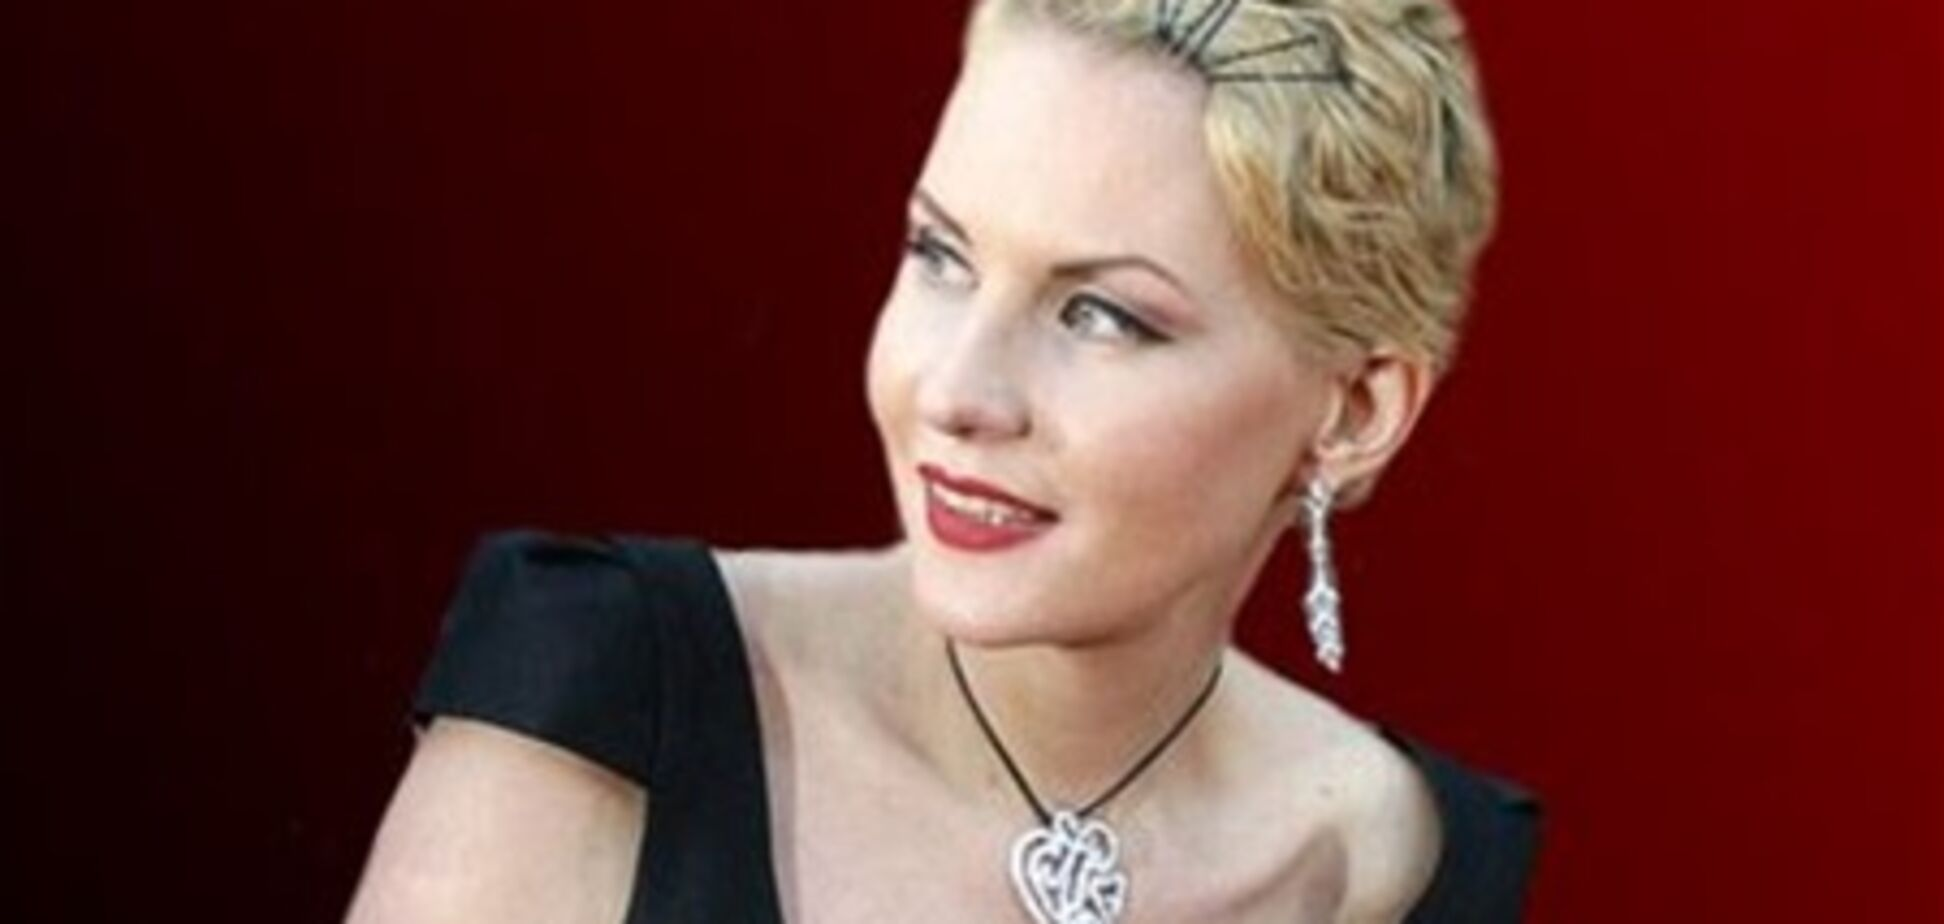 Литвинова шокировала своим внешним видом